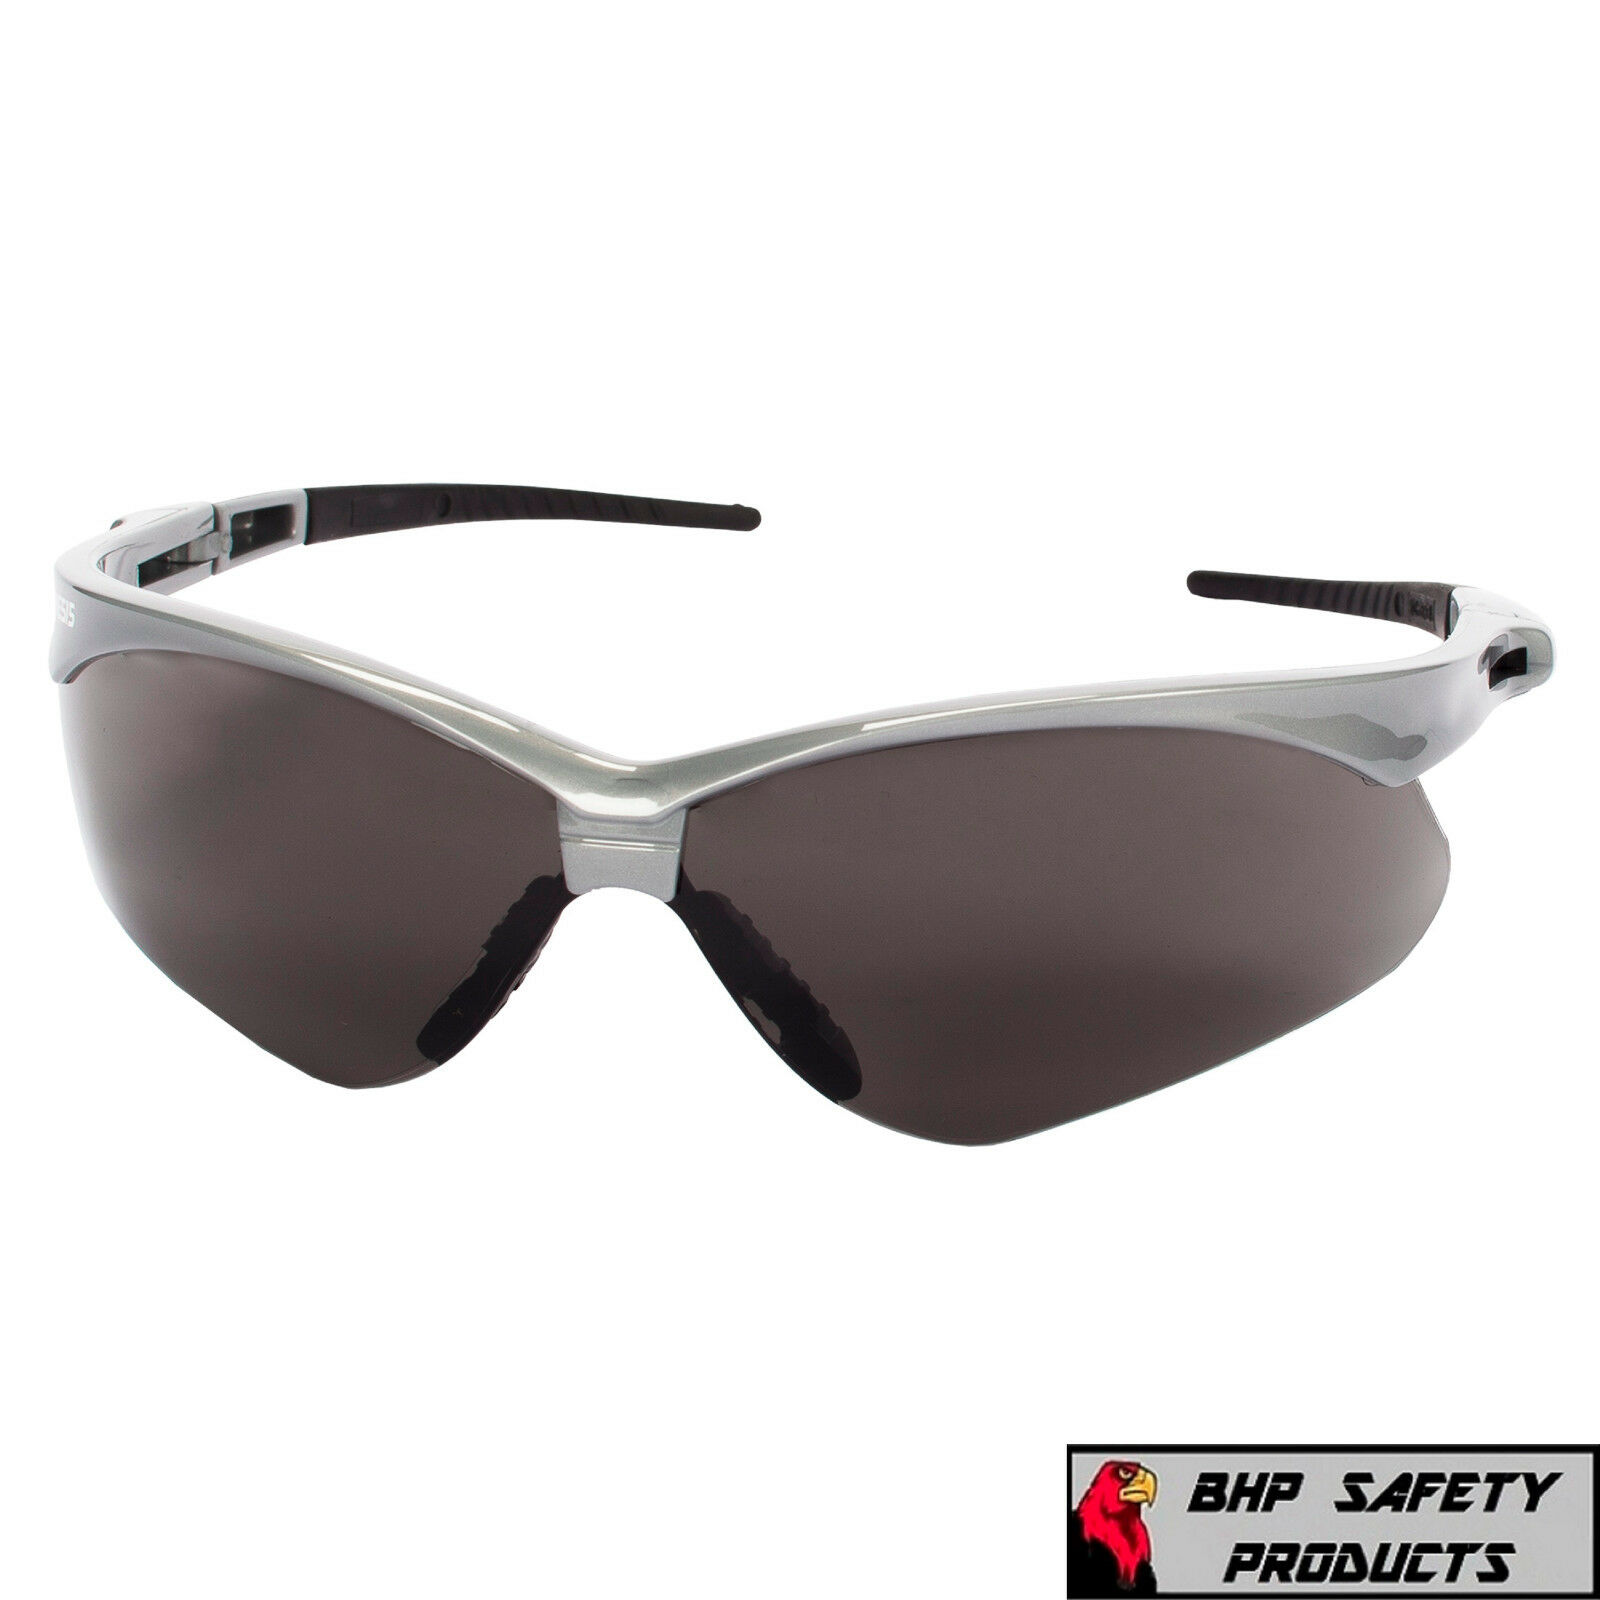 JACKSON NEMESIS SAFETY GLASSES SUNGLASSES SPORT WORK EYEWEAR ANSI Z87 COMPLIANT 47383- Silver Frame/Smoke AF Lens